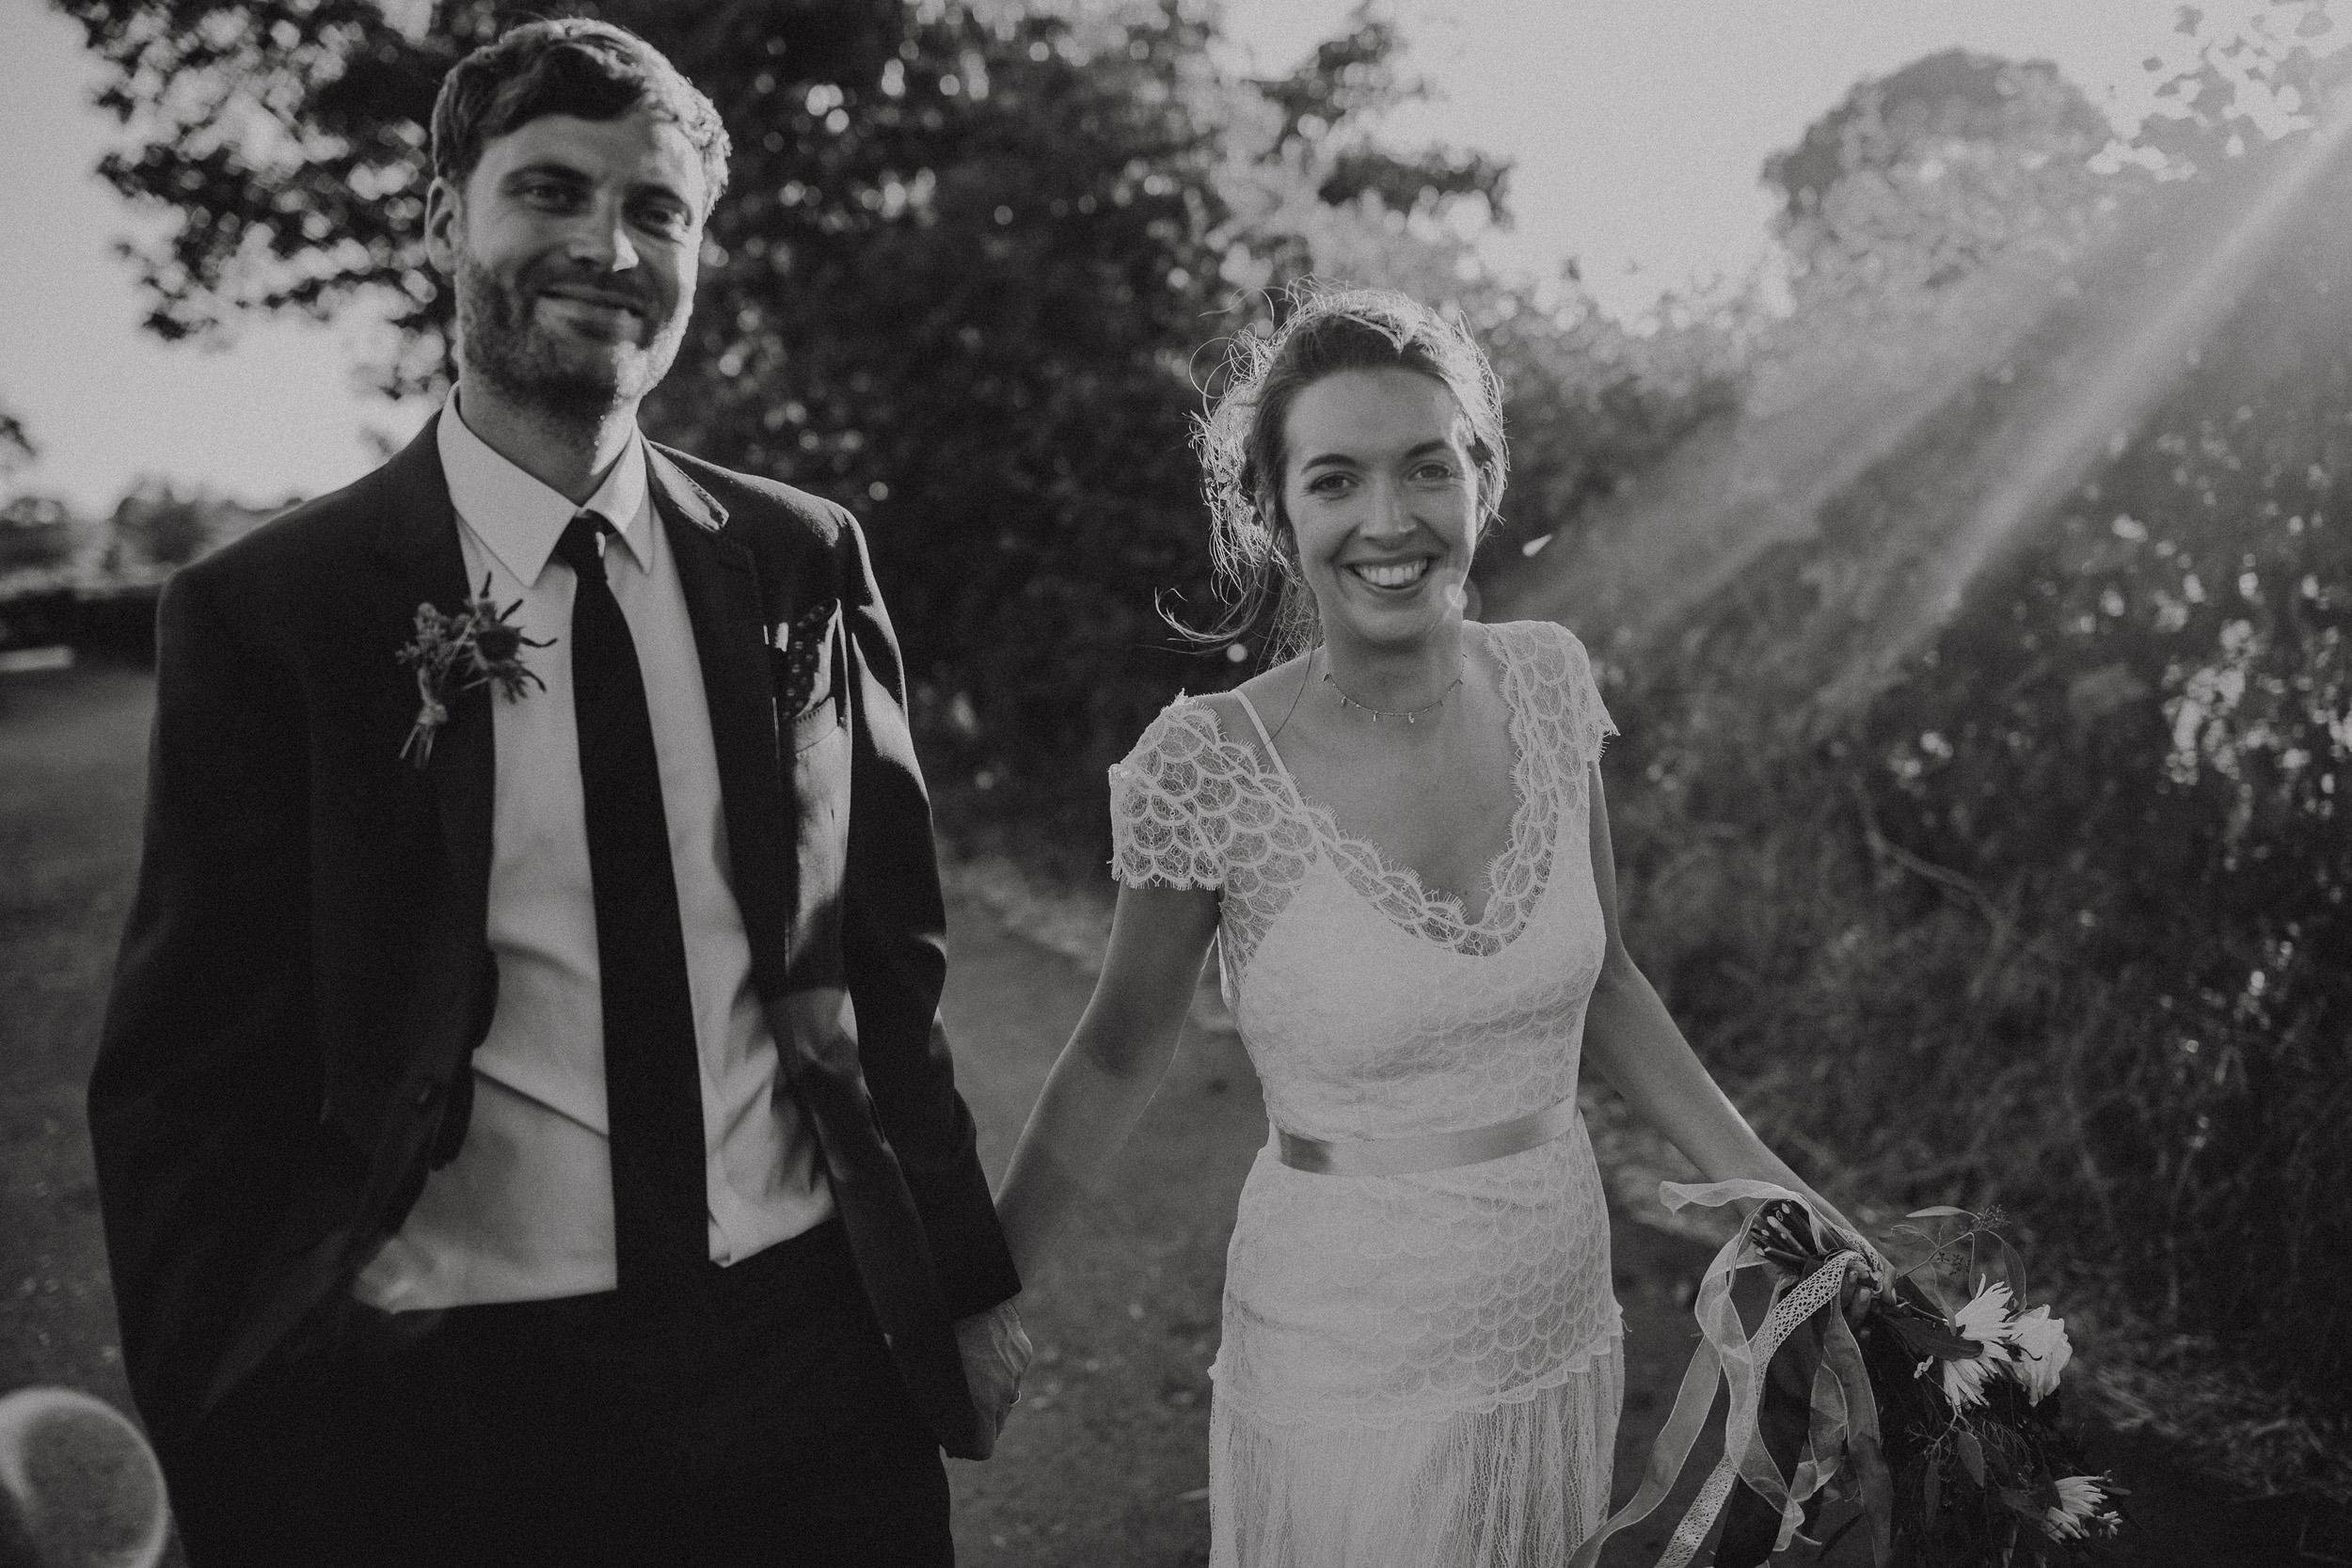 Martha-Laid-Back-Garden-Wedding-Lace-Wedding-Dress-Bohemian-Kate-Beaumont-52.jpg